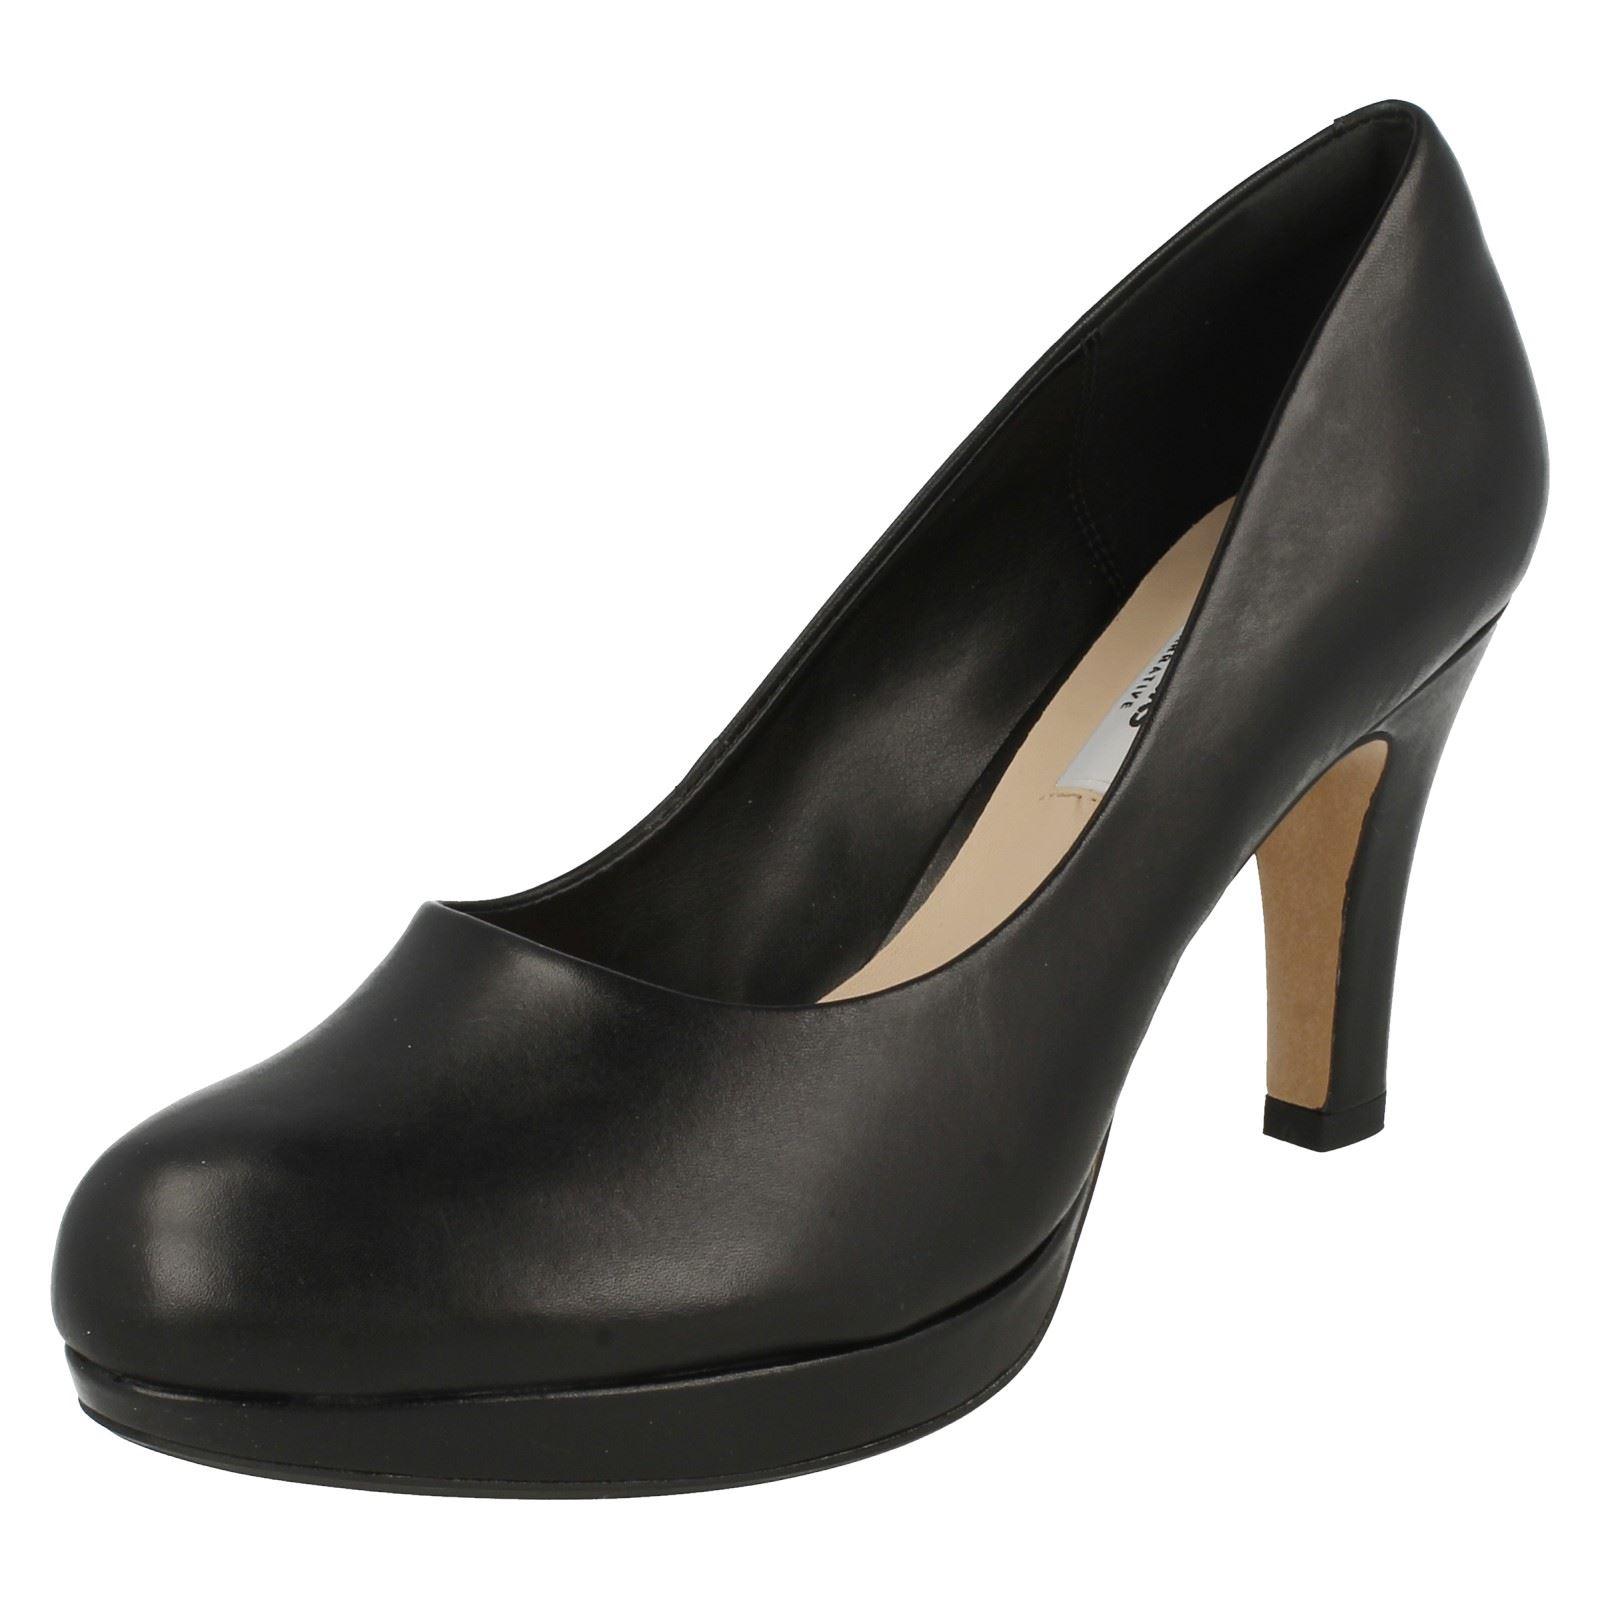 Onorevoli Clarks Shoes, Shoes, Shoes, frusciante Kendra 4e0d21